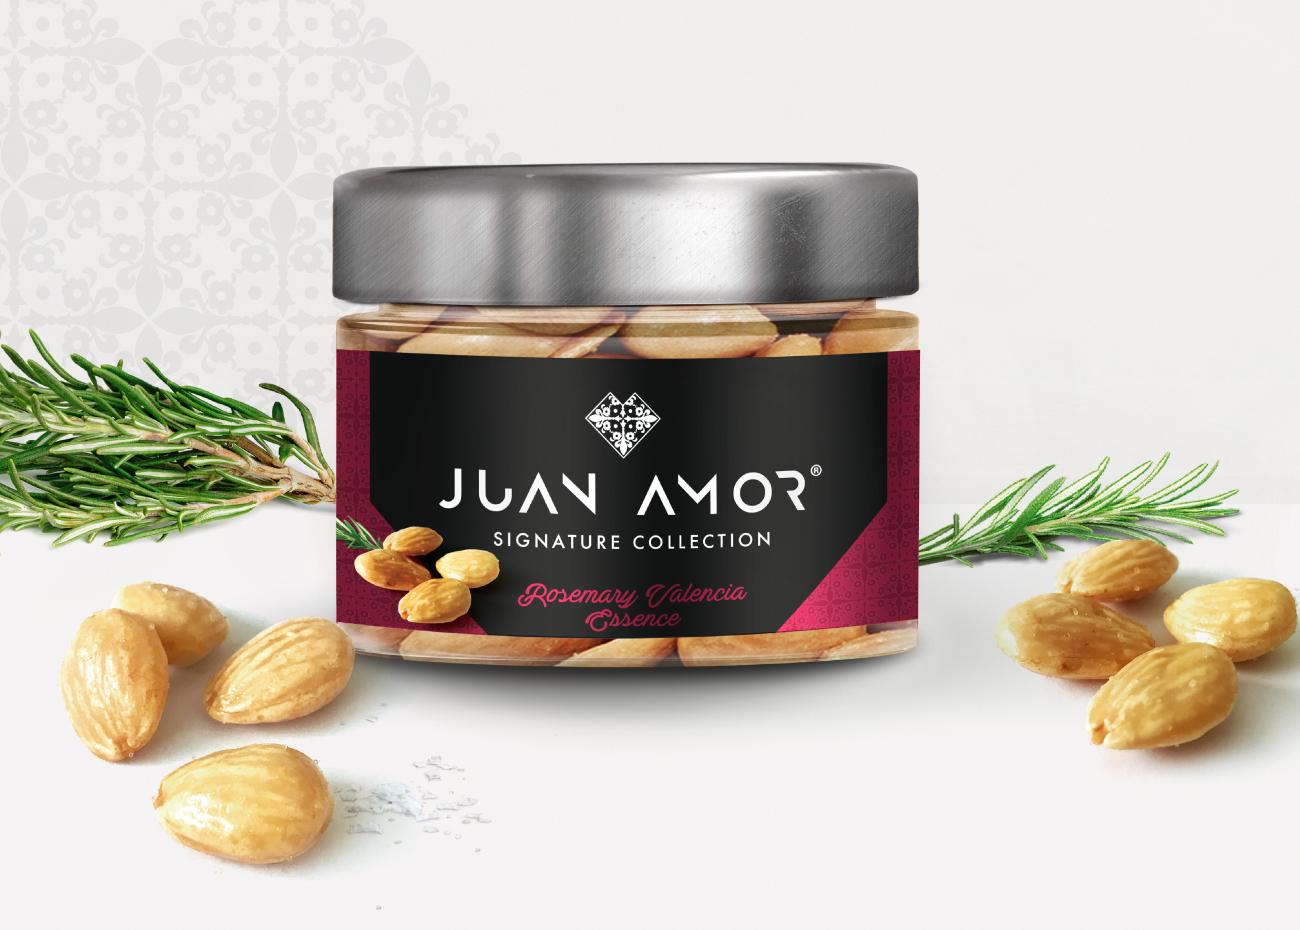 Juan Amor Rosemary